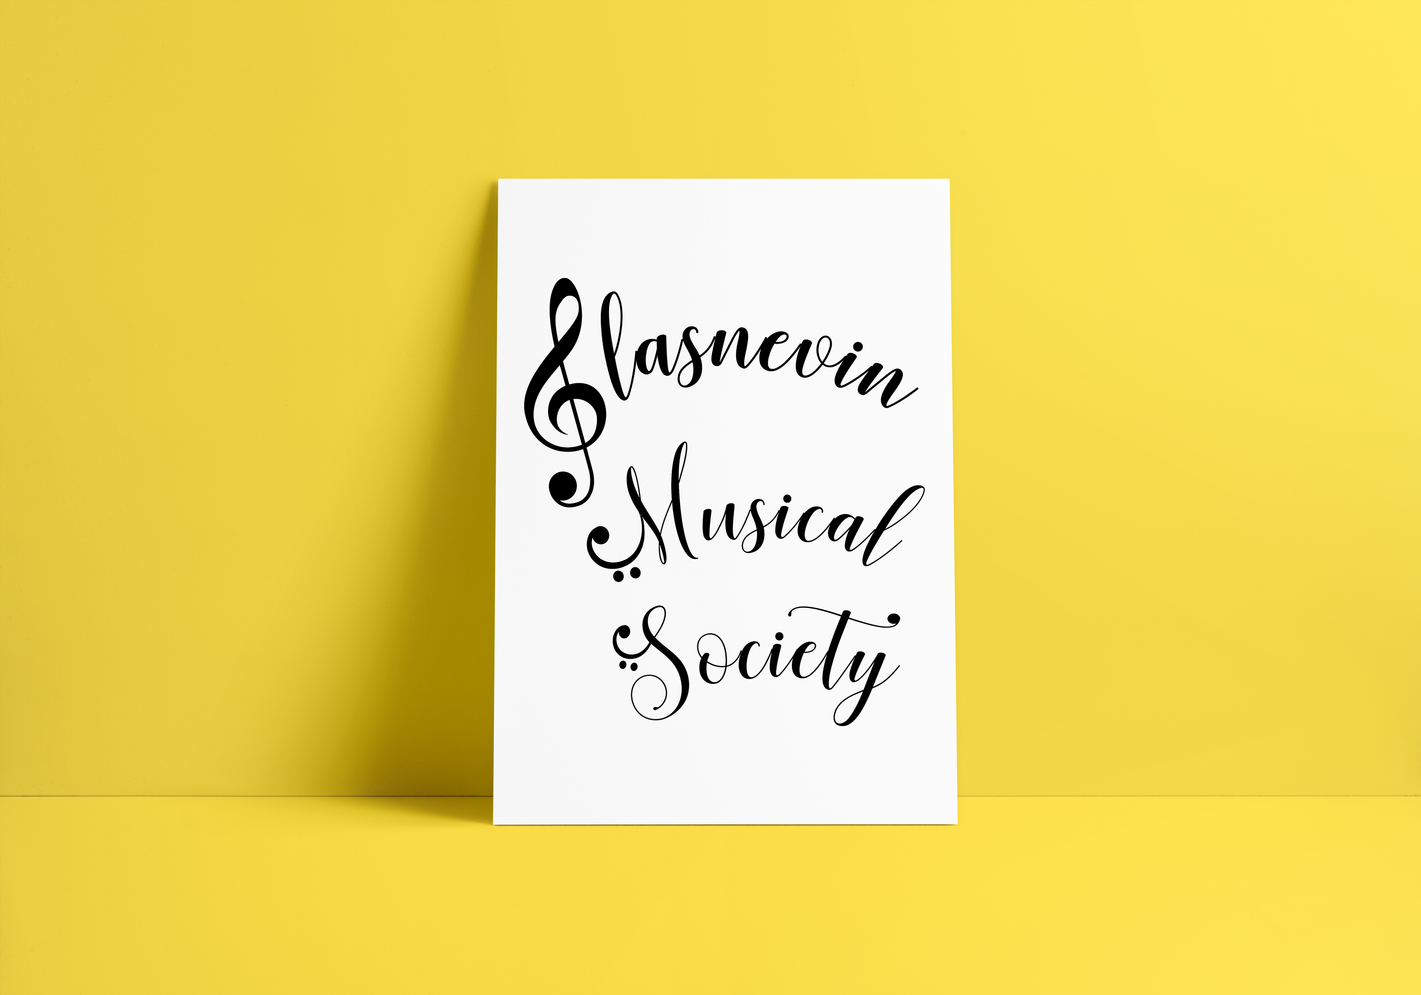 Glasnevin Musical Society